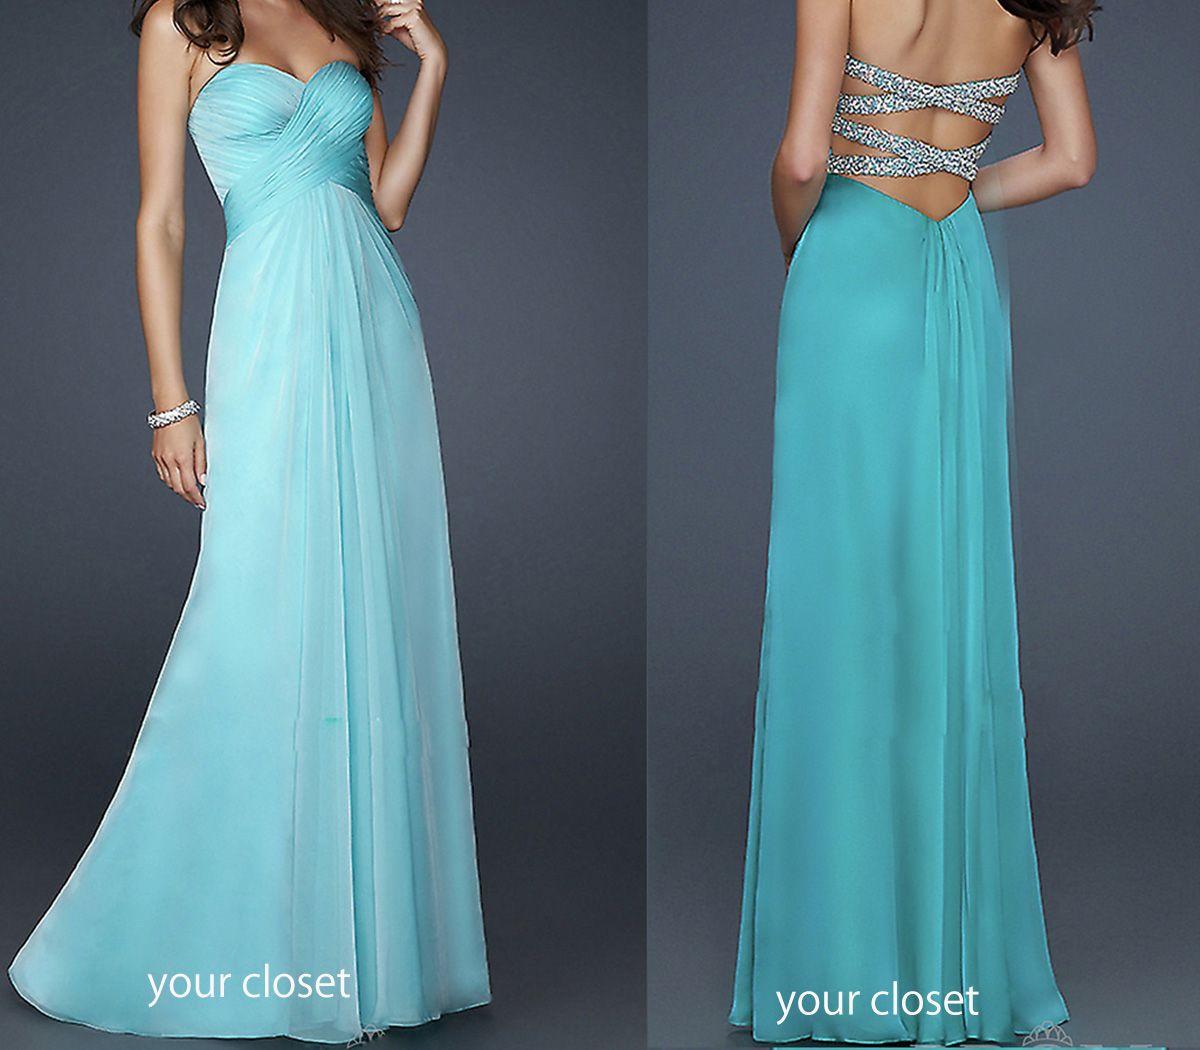 Dress code: MG0001 Fabric:Chiffon Embellishment:Sequins Straps ...